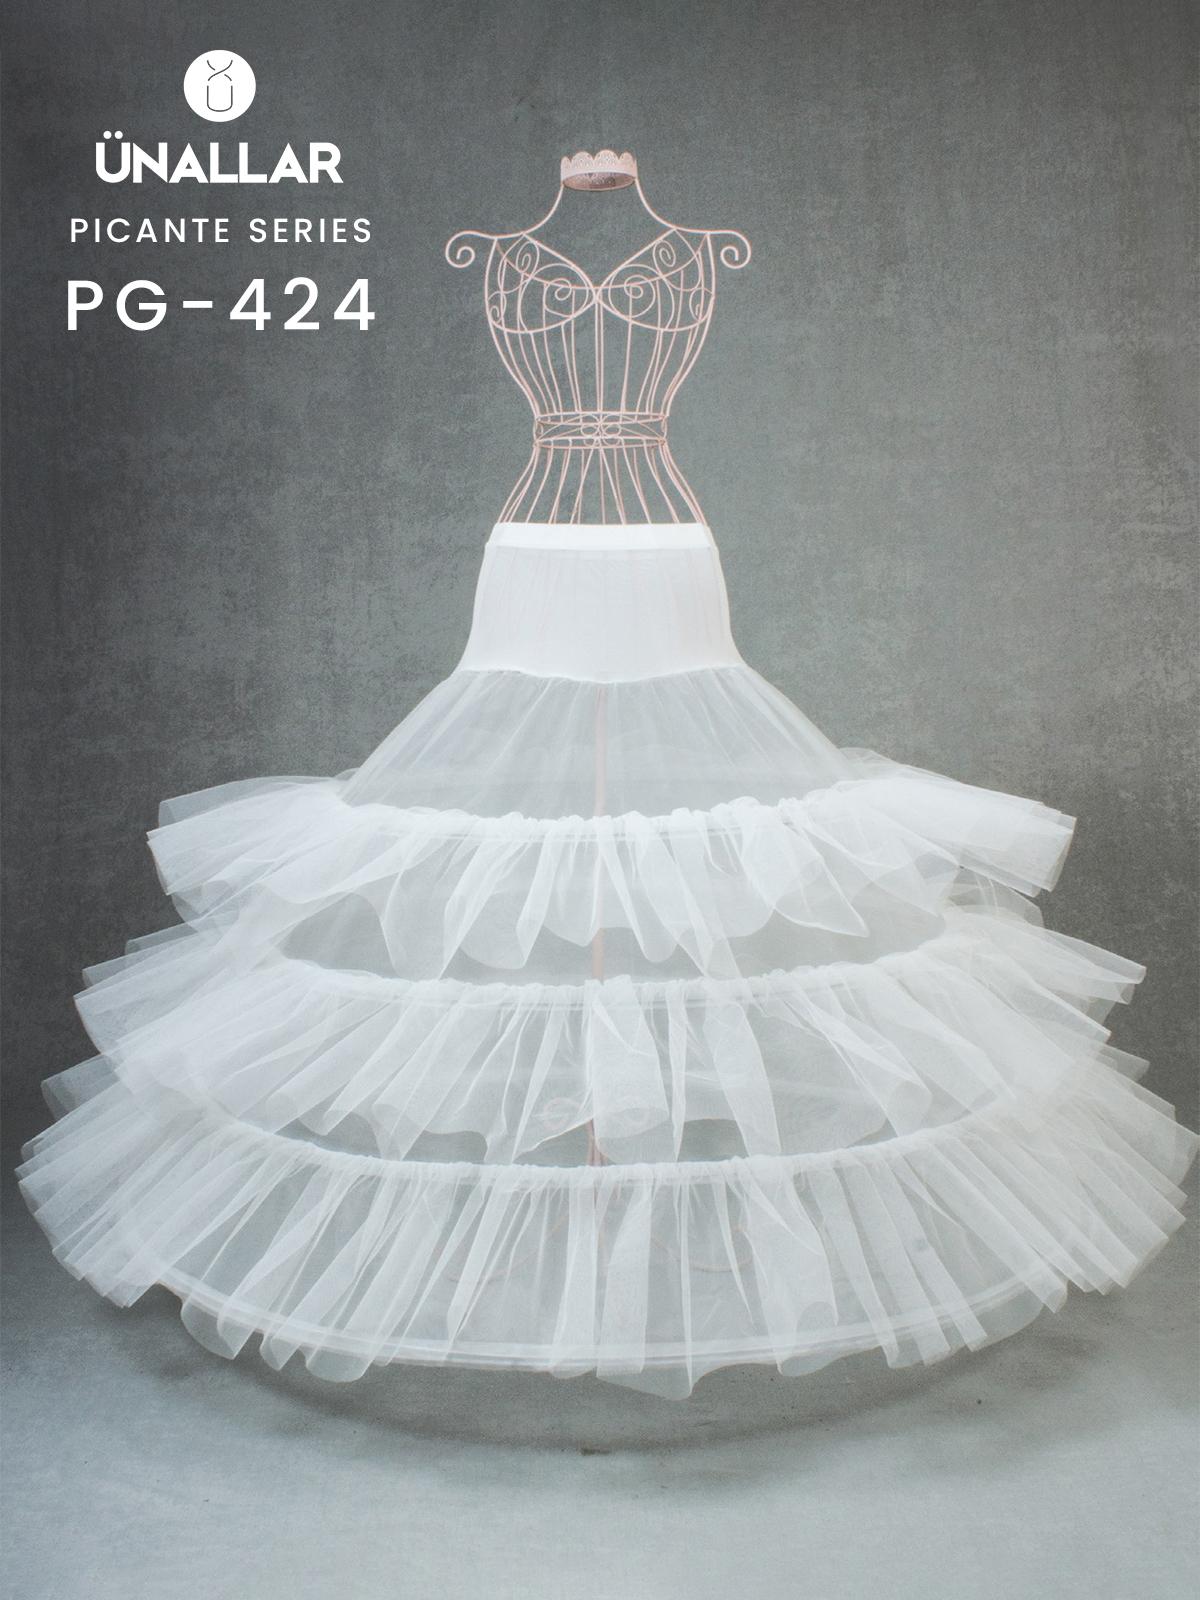 pg-424